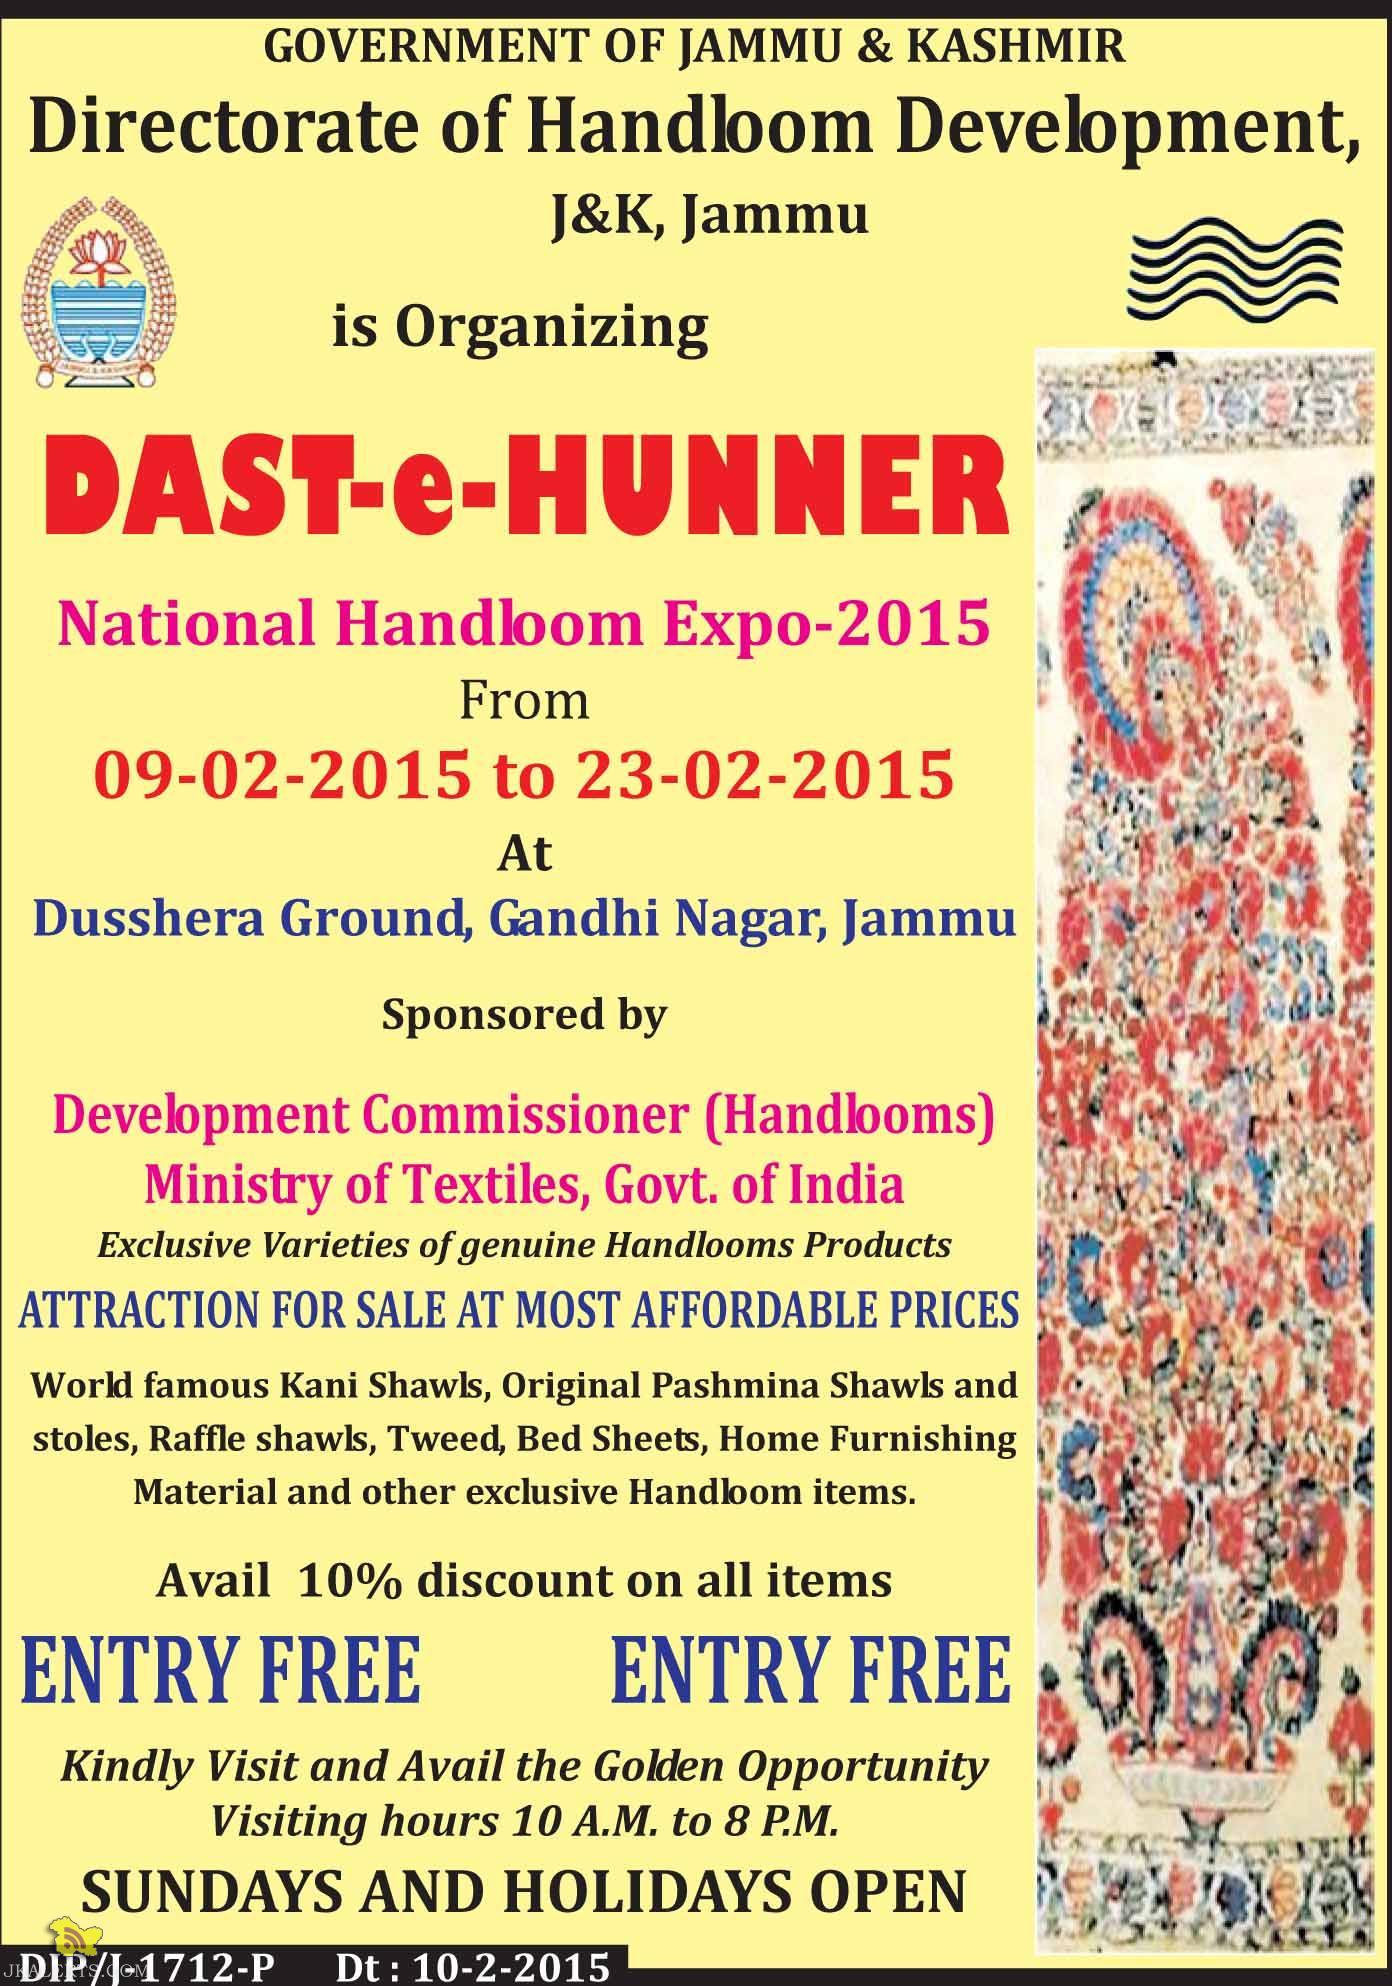 Handloom Development, DAST-e-HUNNER, National Handloom Expo-2015